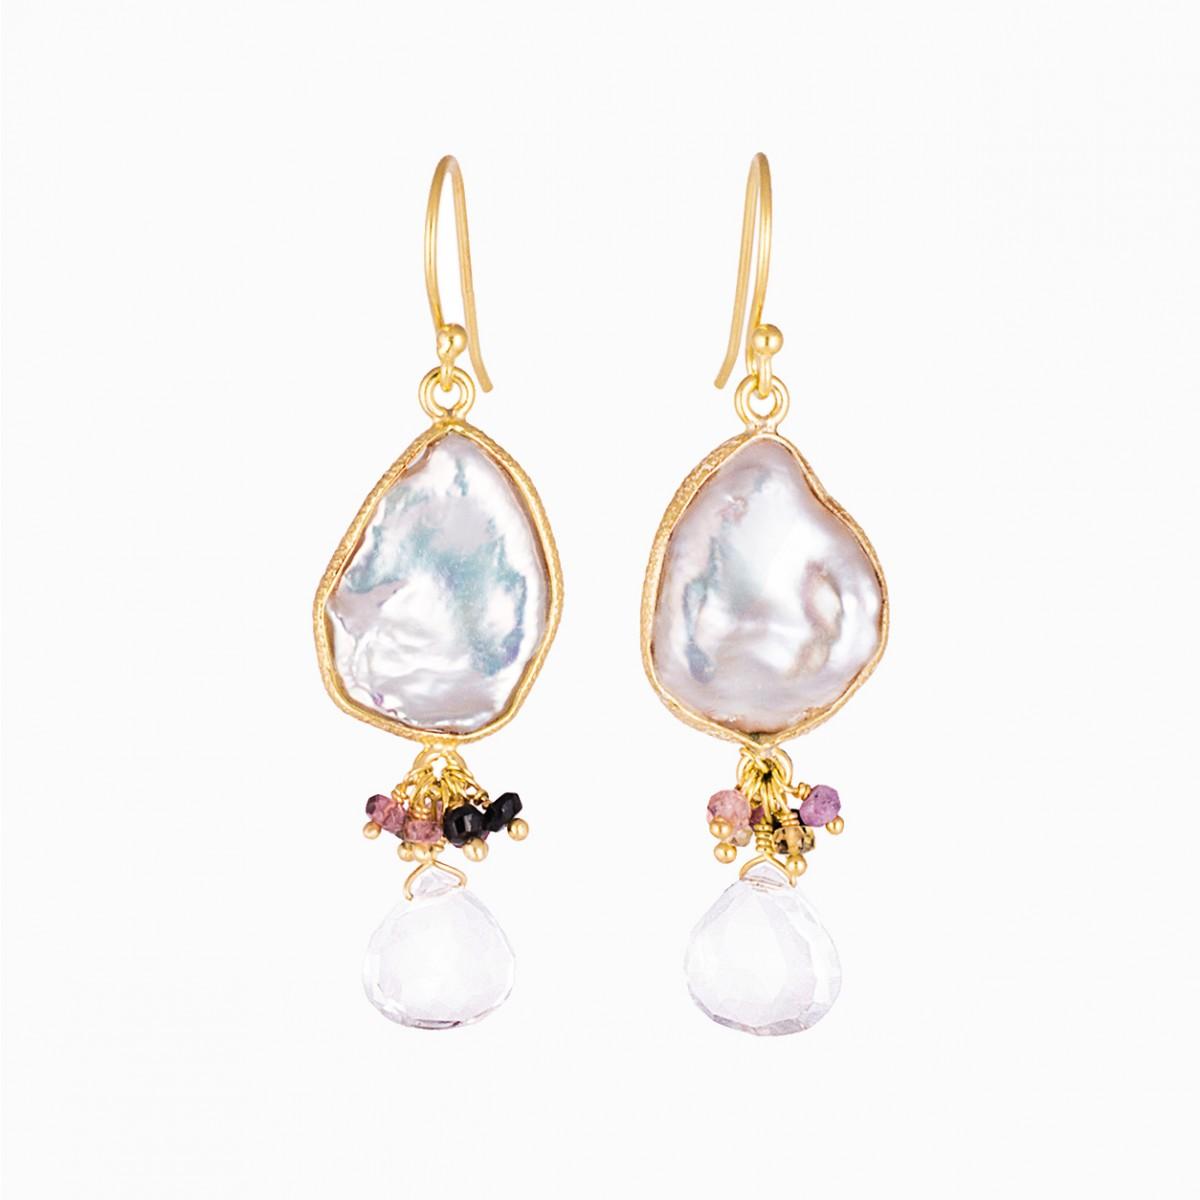 Gemstone Deepika Earrings - Pearl & Tourmaline